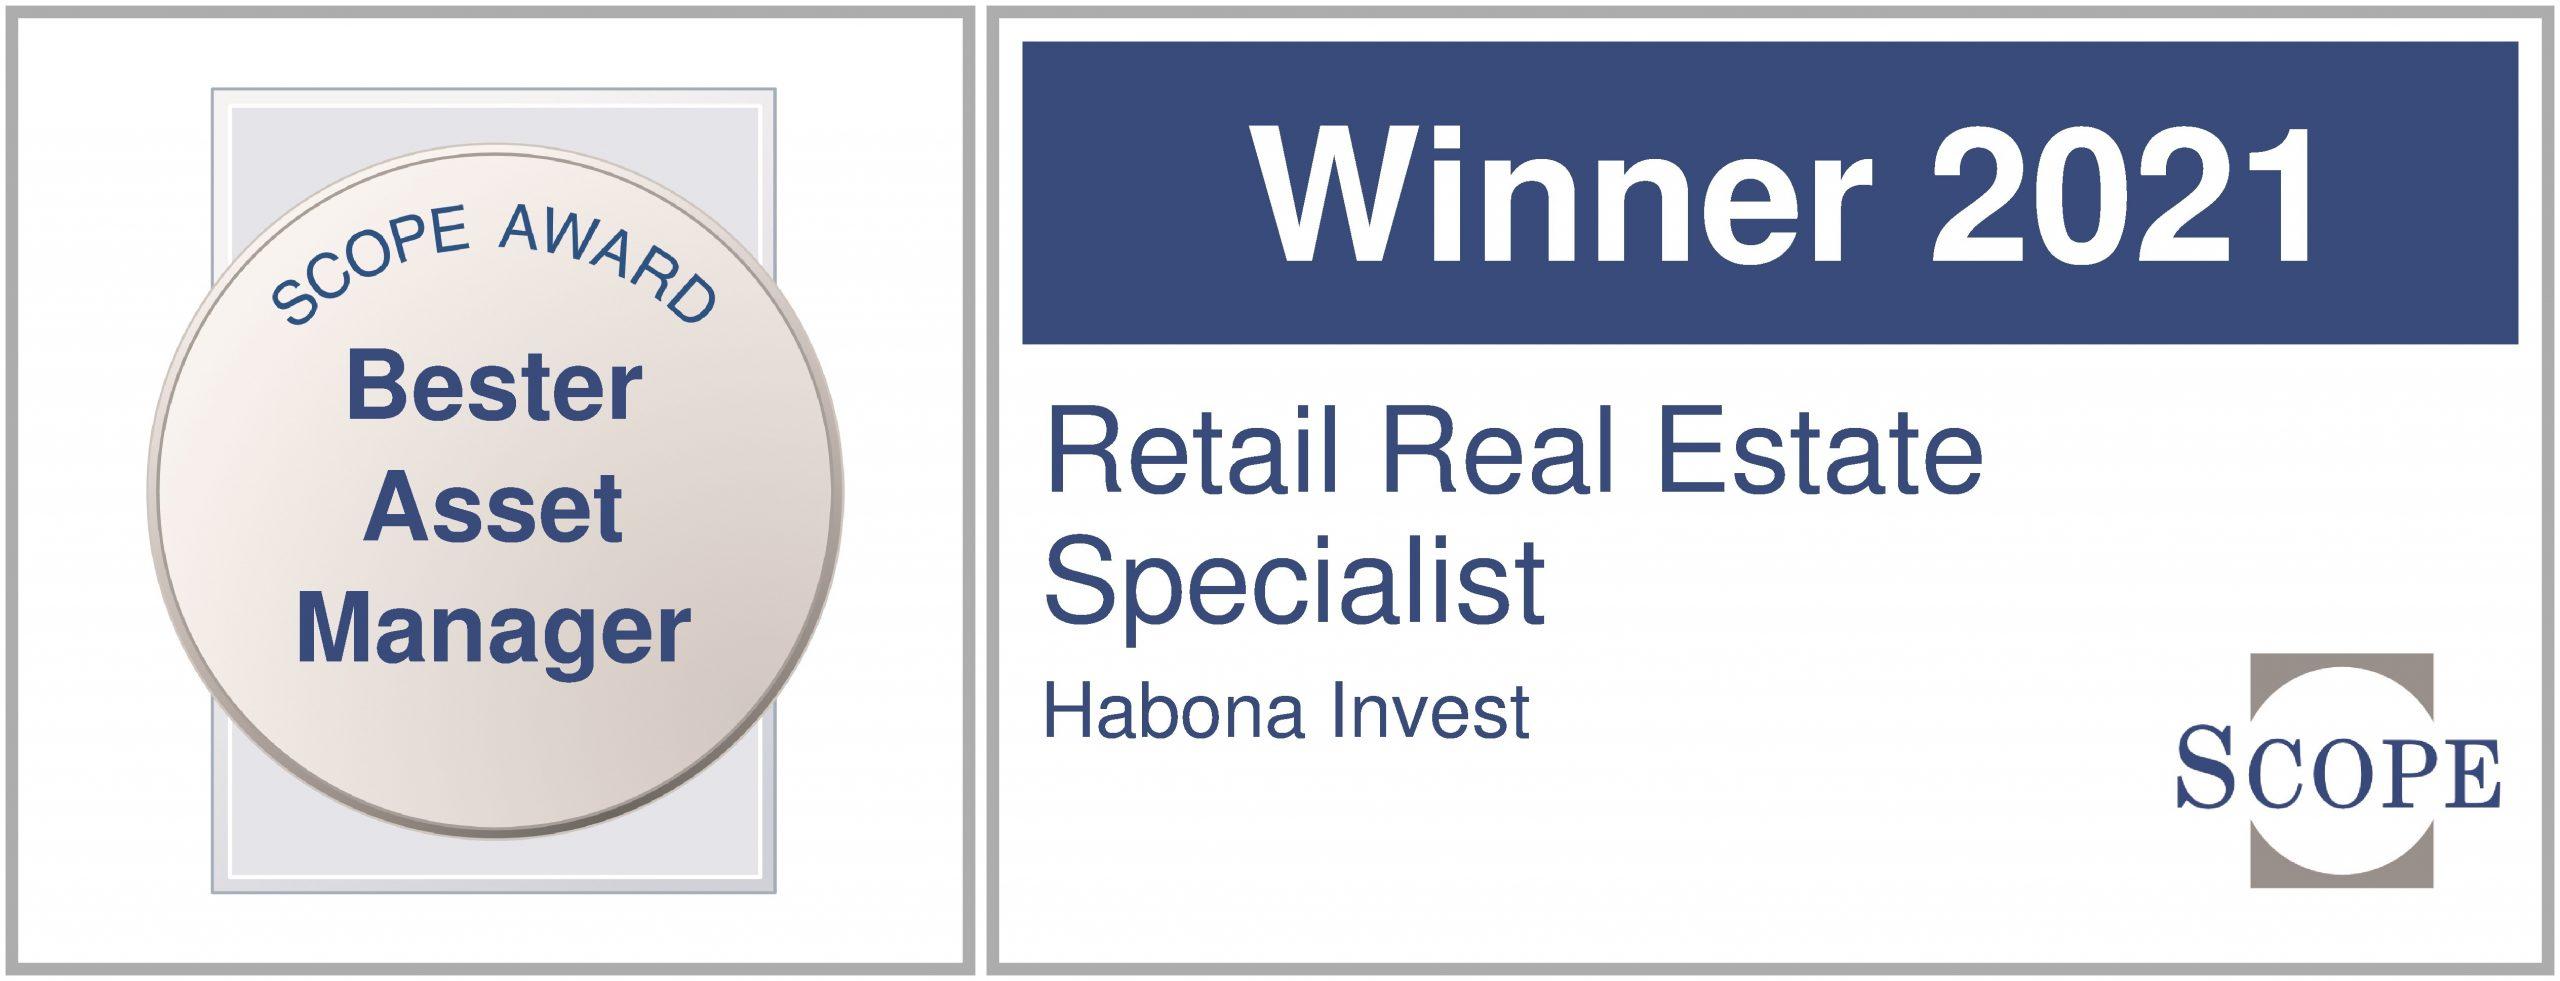 Habona gewinnt Scope Award